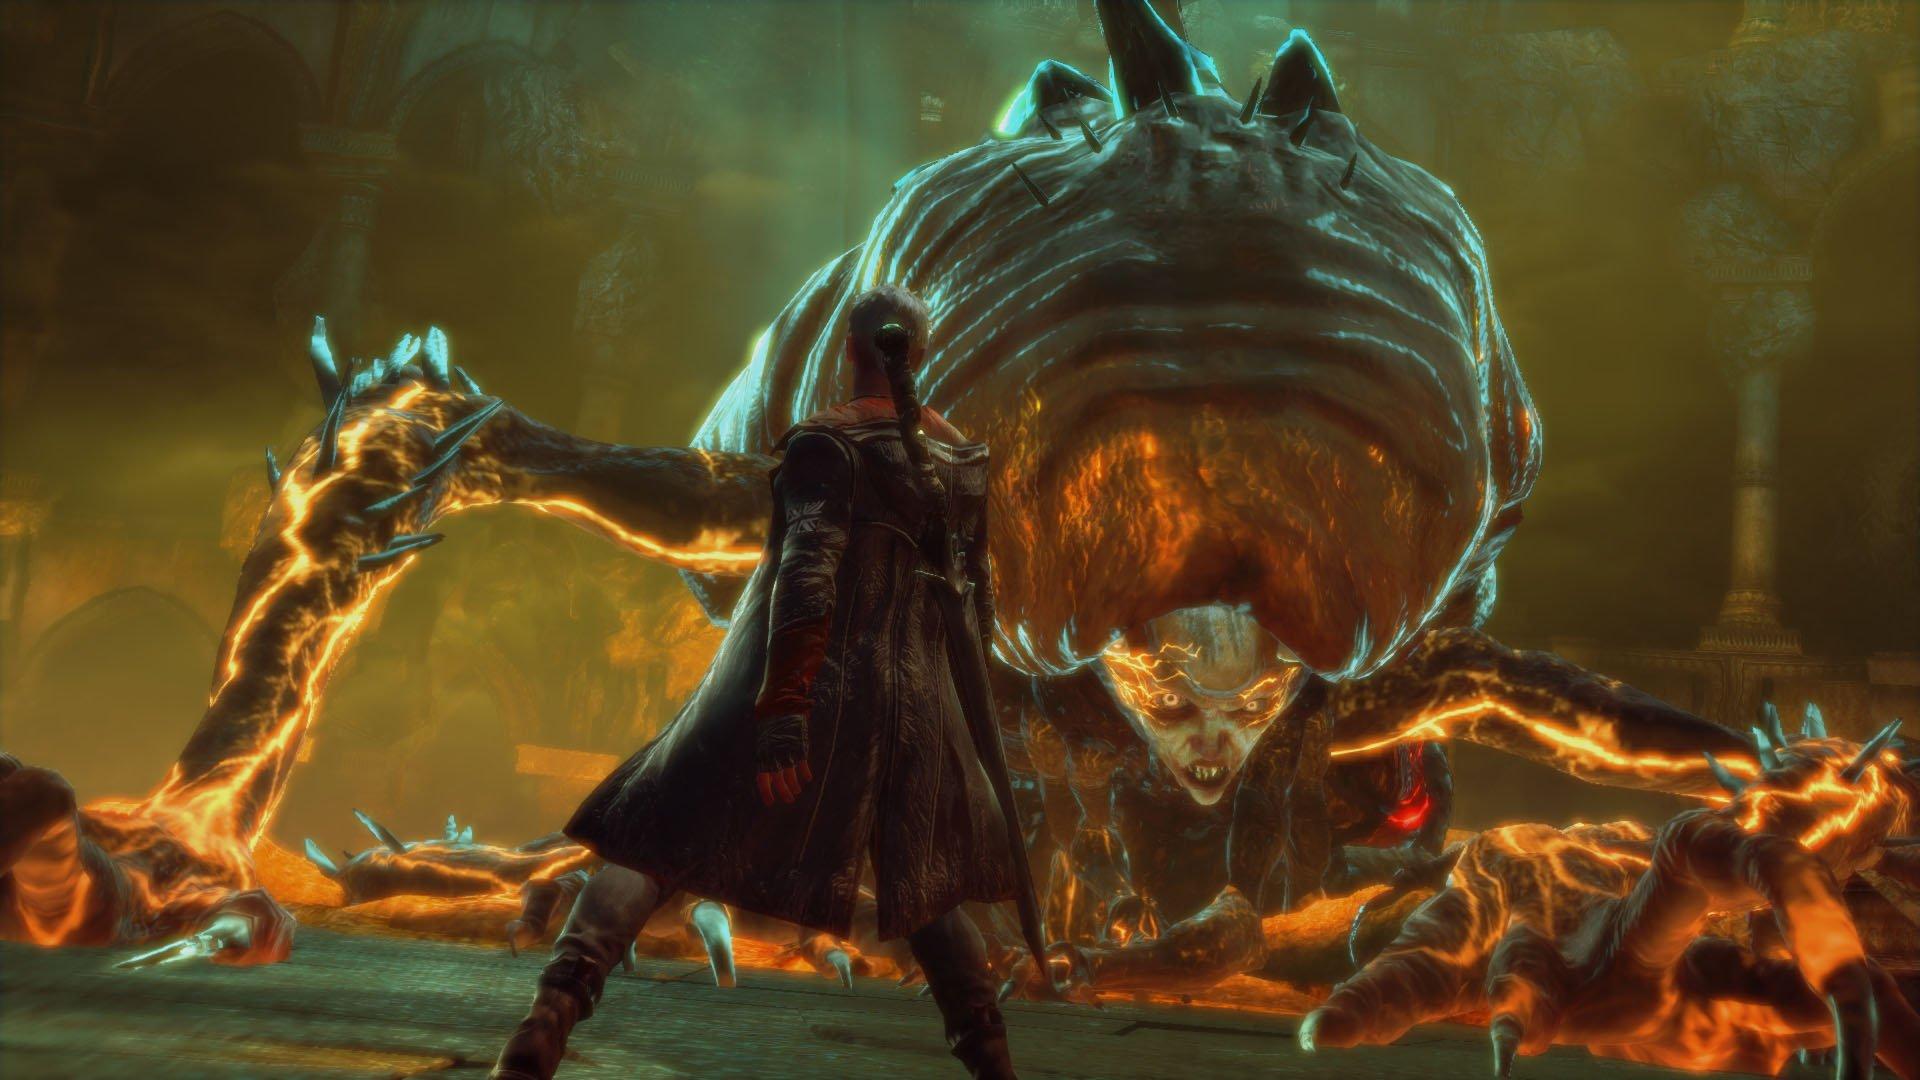 DmC: Devil May Cry - Definitive Edition (PlayStation 4) Screenshots